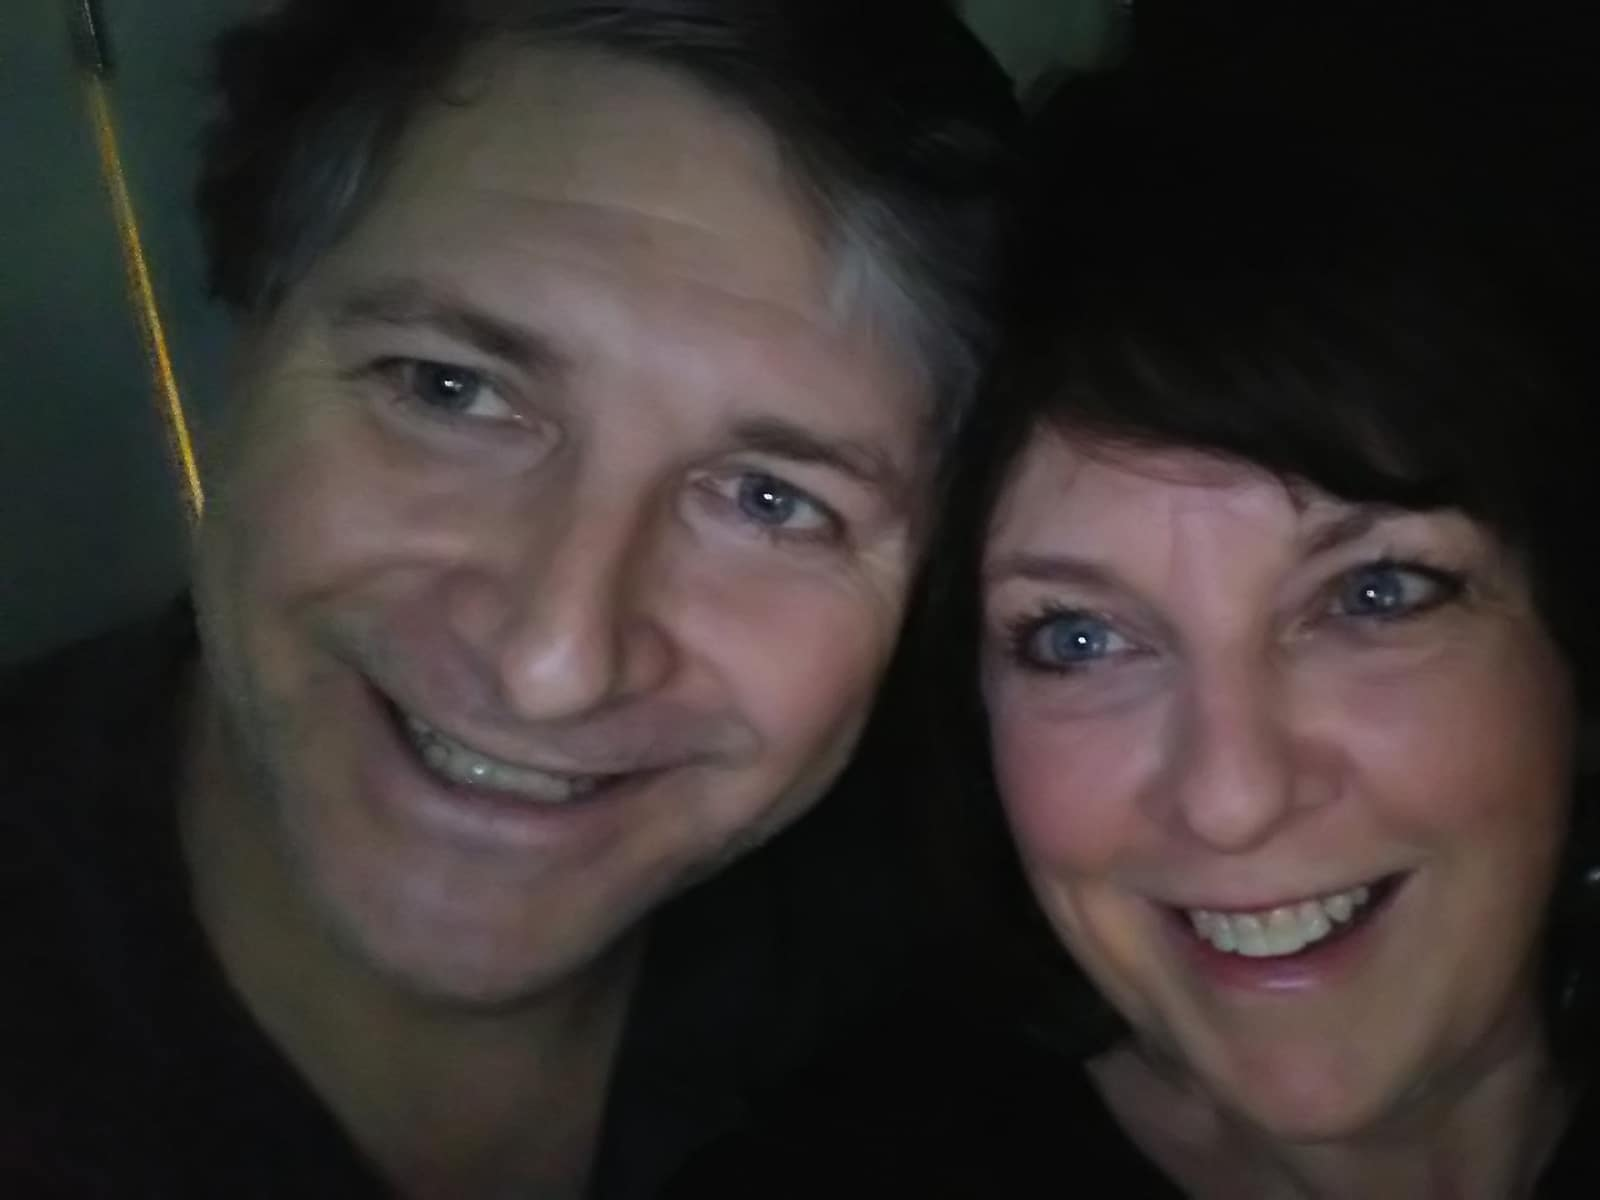 Laura & Chris from Kitchener, Ontario, Canada